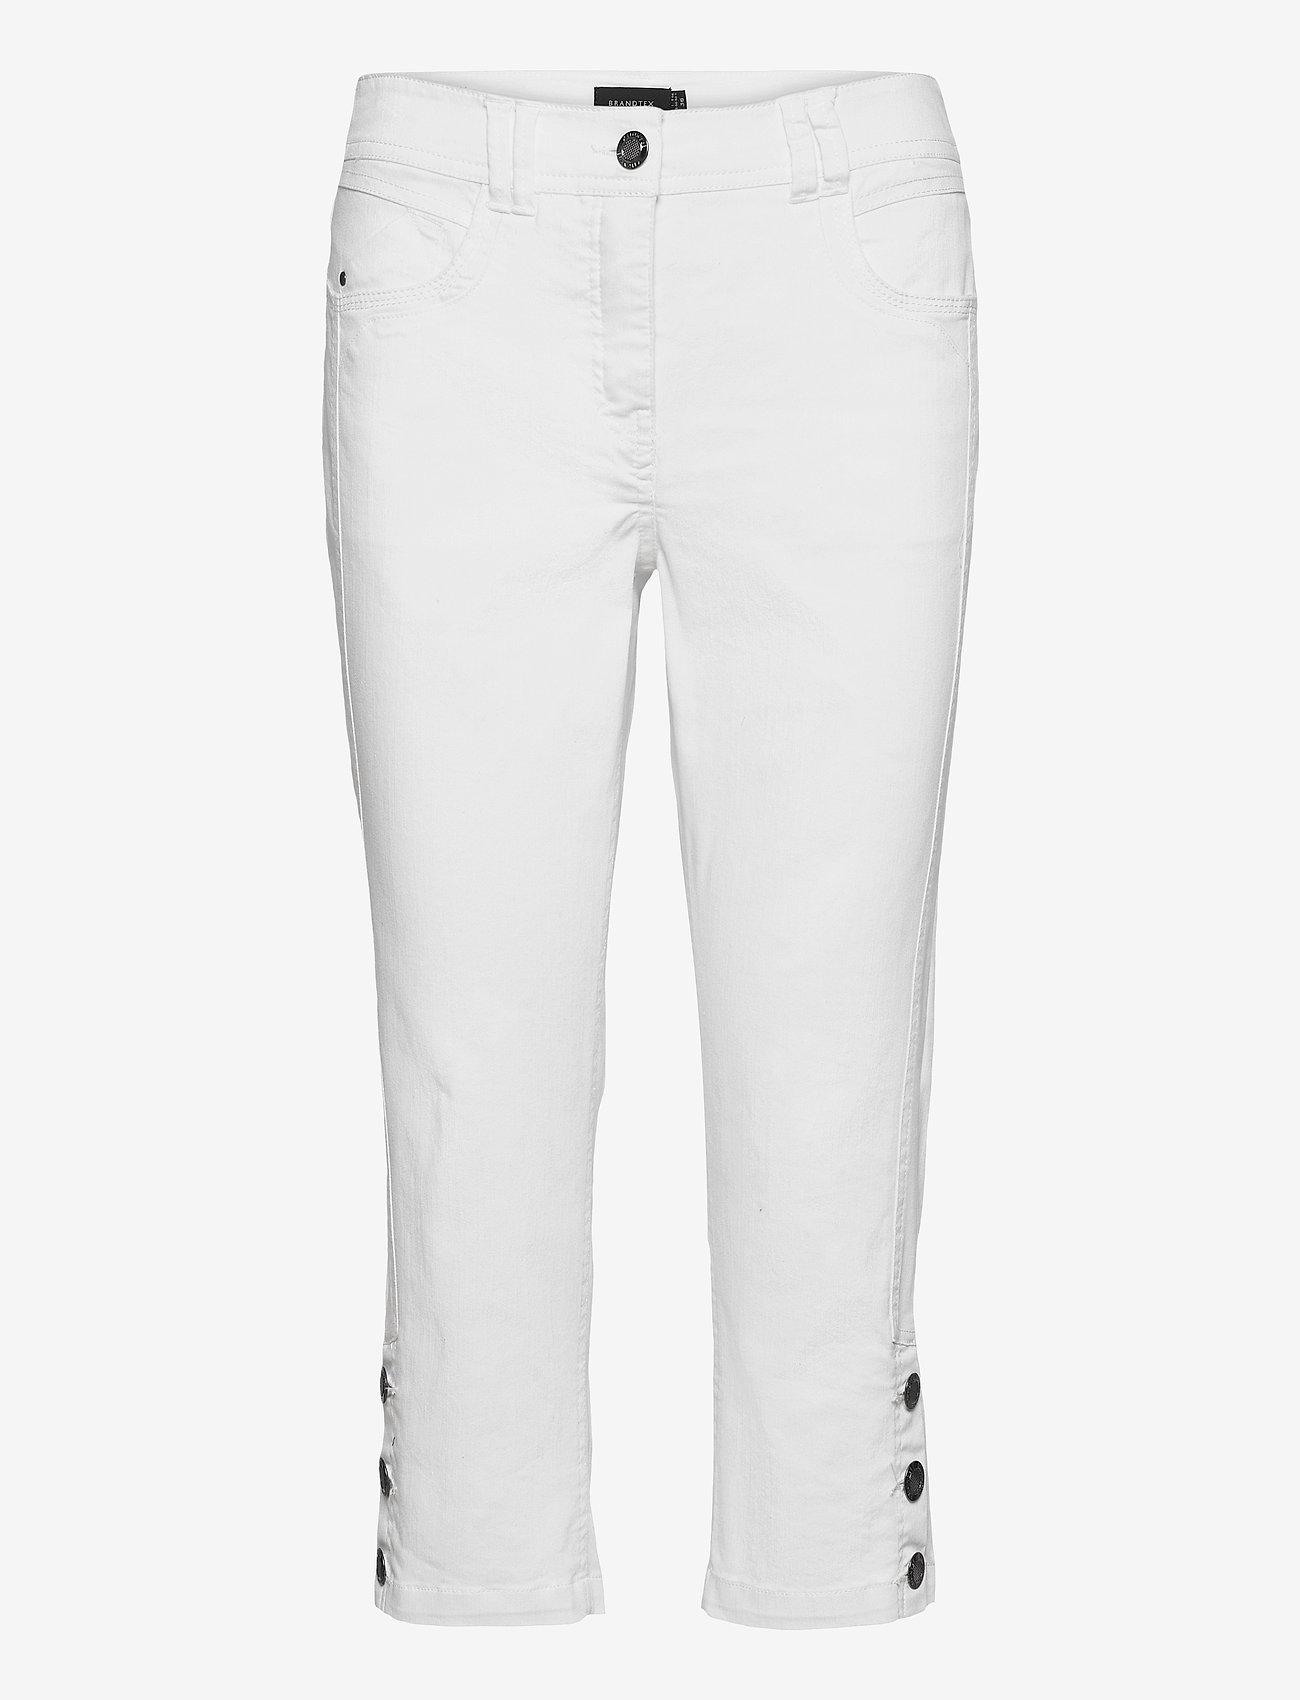 Brandtex - Capri pants - pantalons capri - white - 1